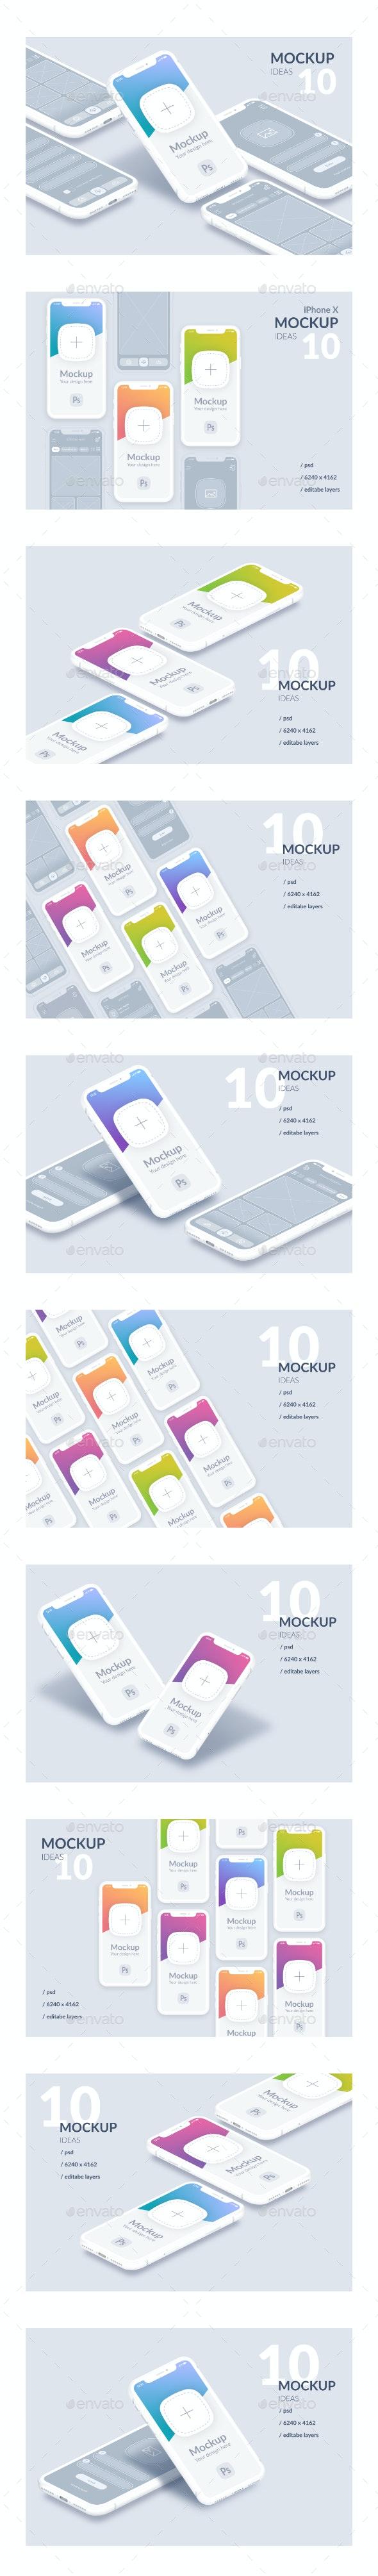 Mockup Mobile Device - Mobile Displays